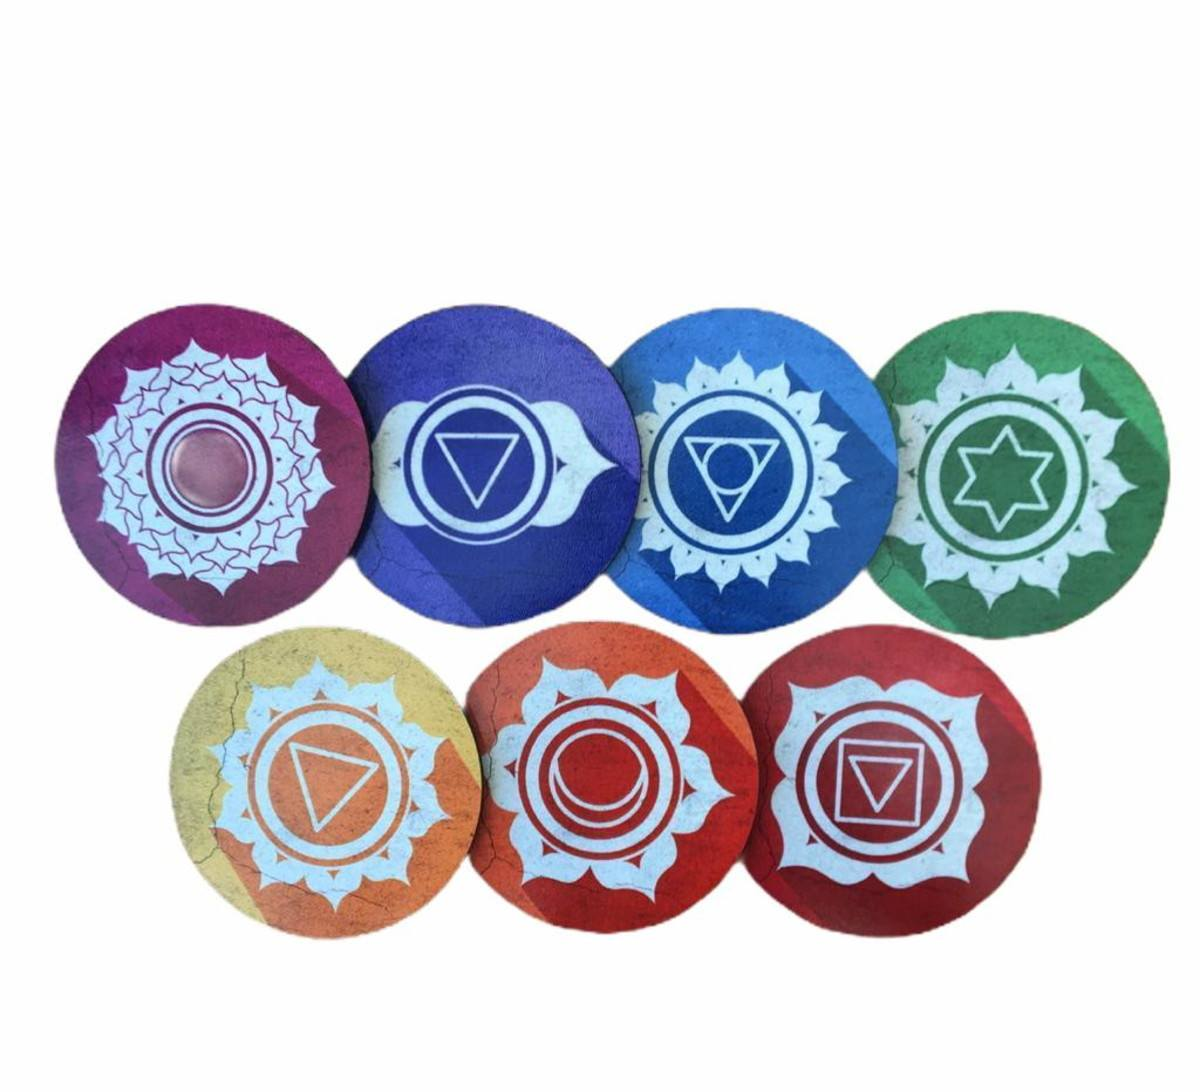 Kit Mandala Decorativa 7 Chakras em MDF 9 cm diametro (Porta Copos).